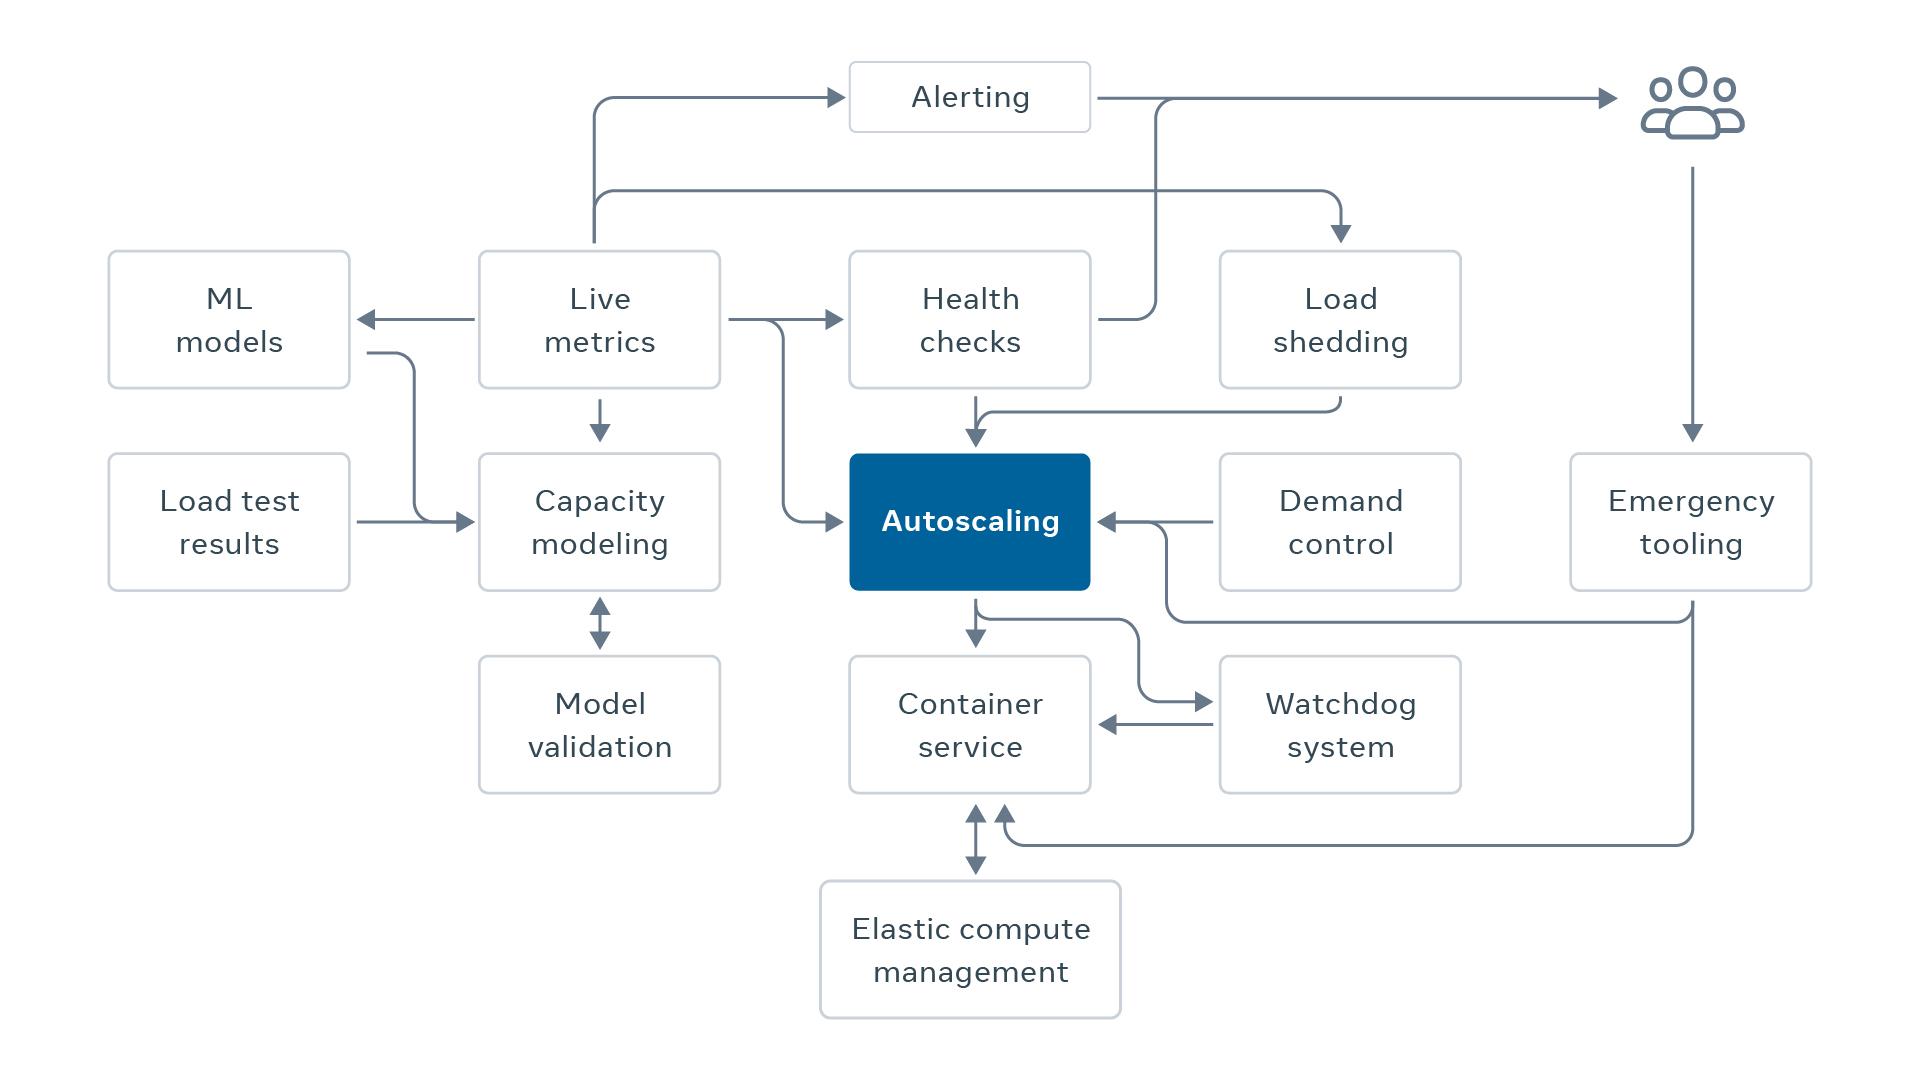 Throughput Autoscaling diagram